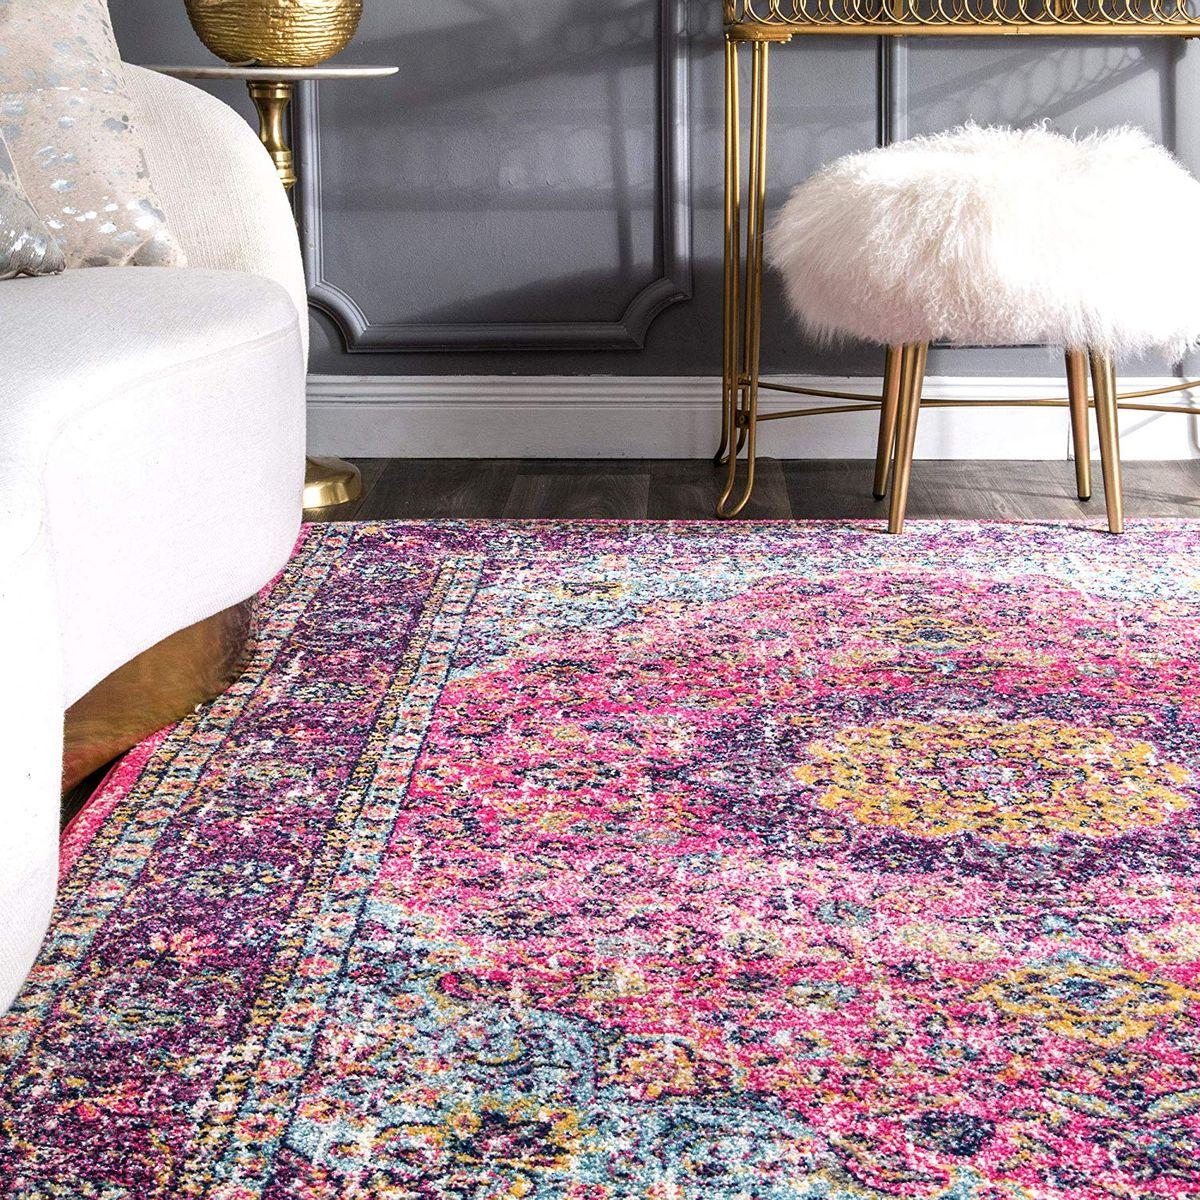 20 Inexpensive Teen Bedroom Decoration Ideas 2020 The Strategist New York Magazine